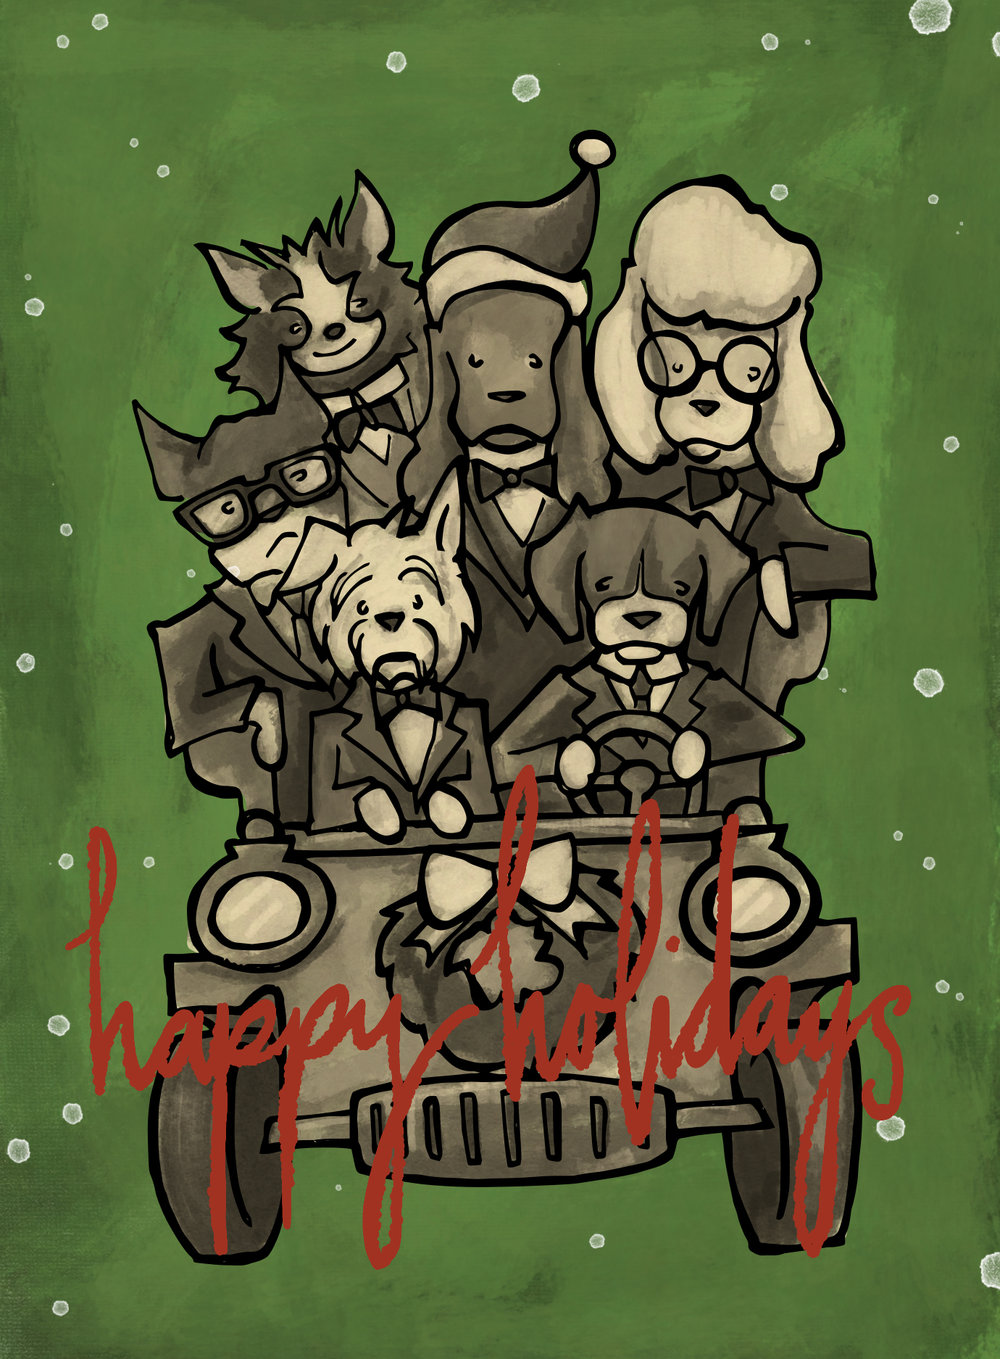 Dog Christmas Car.jpg